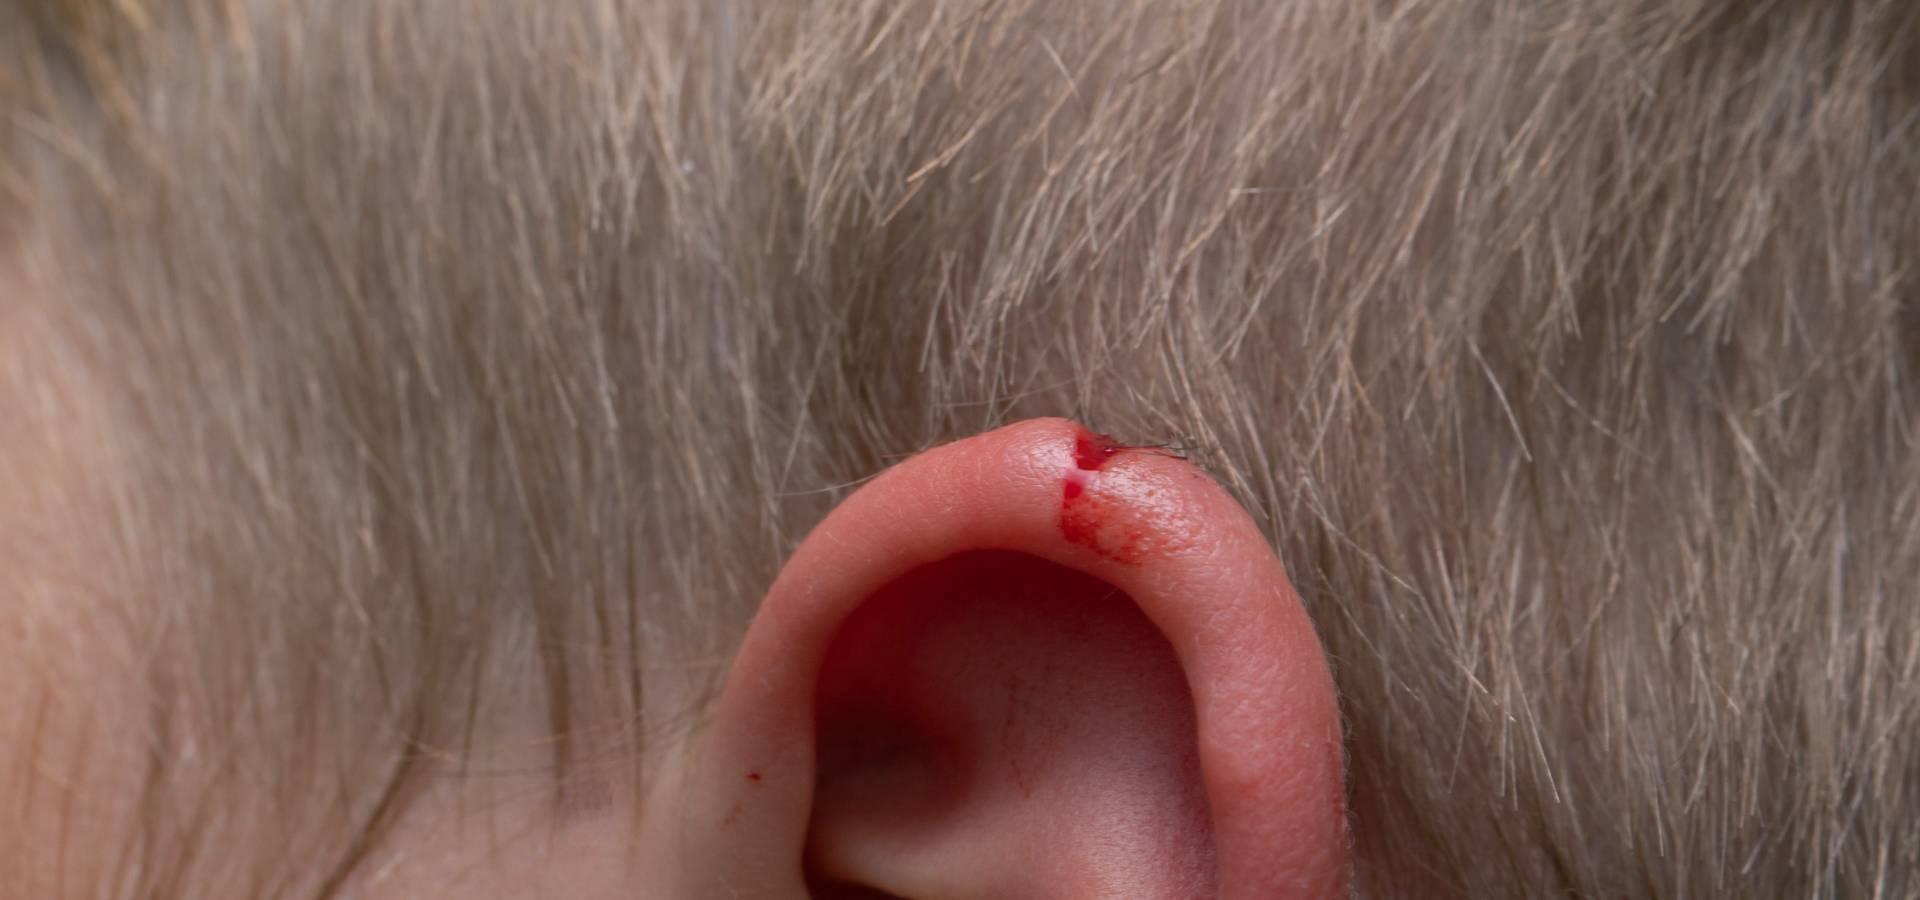 Ear Skin Laceration